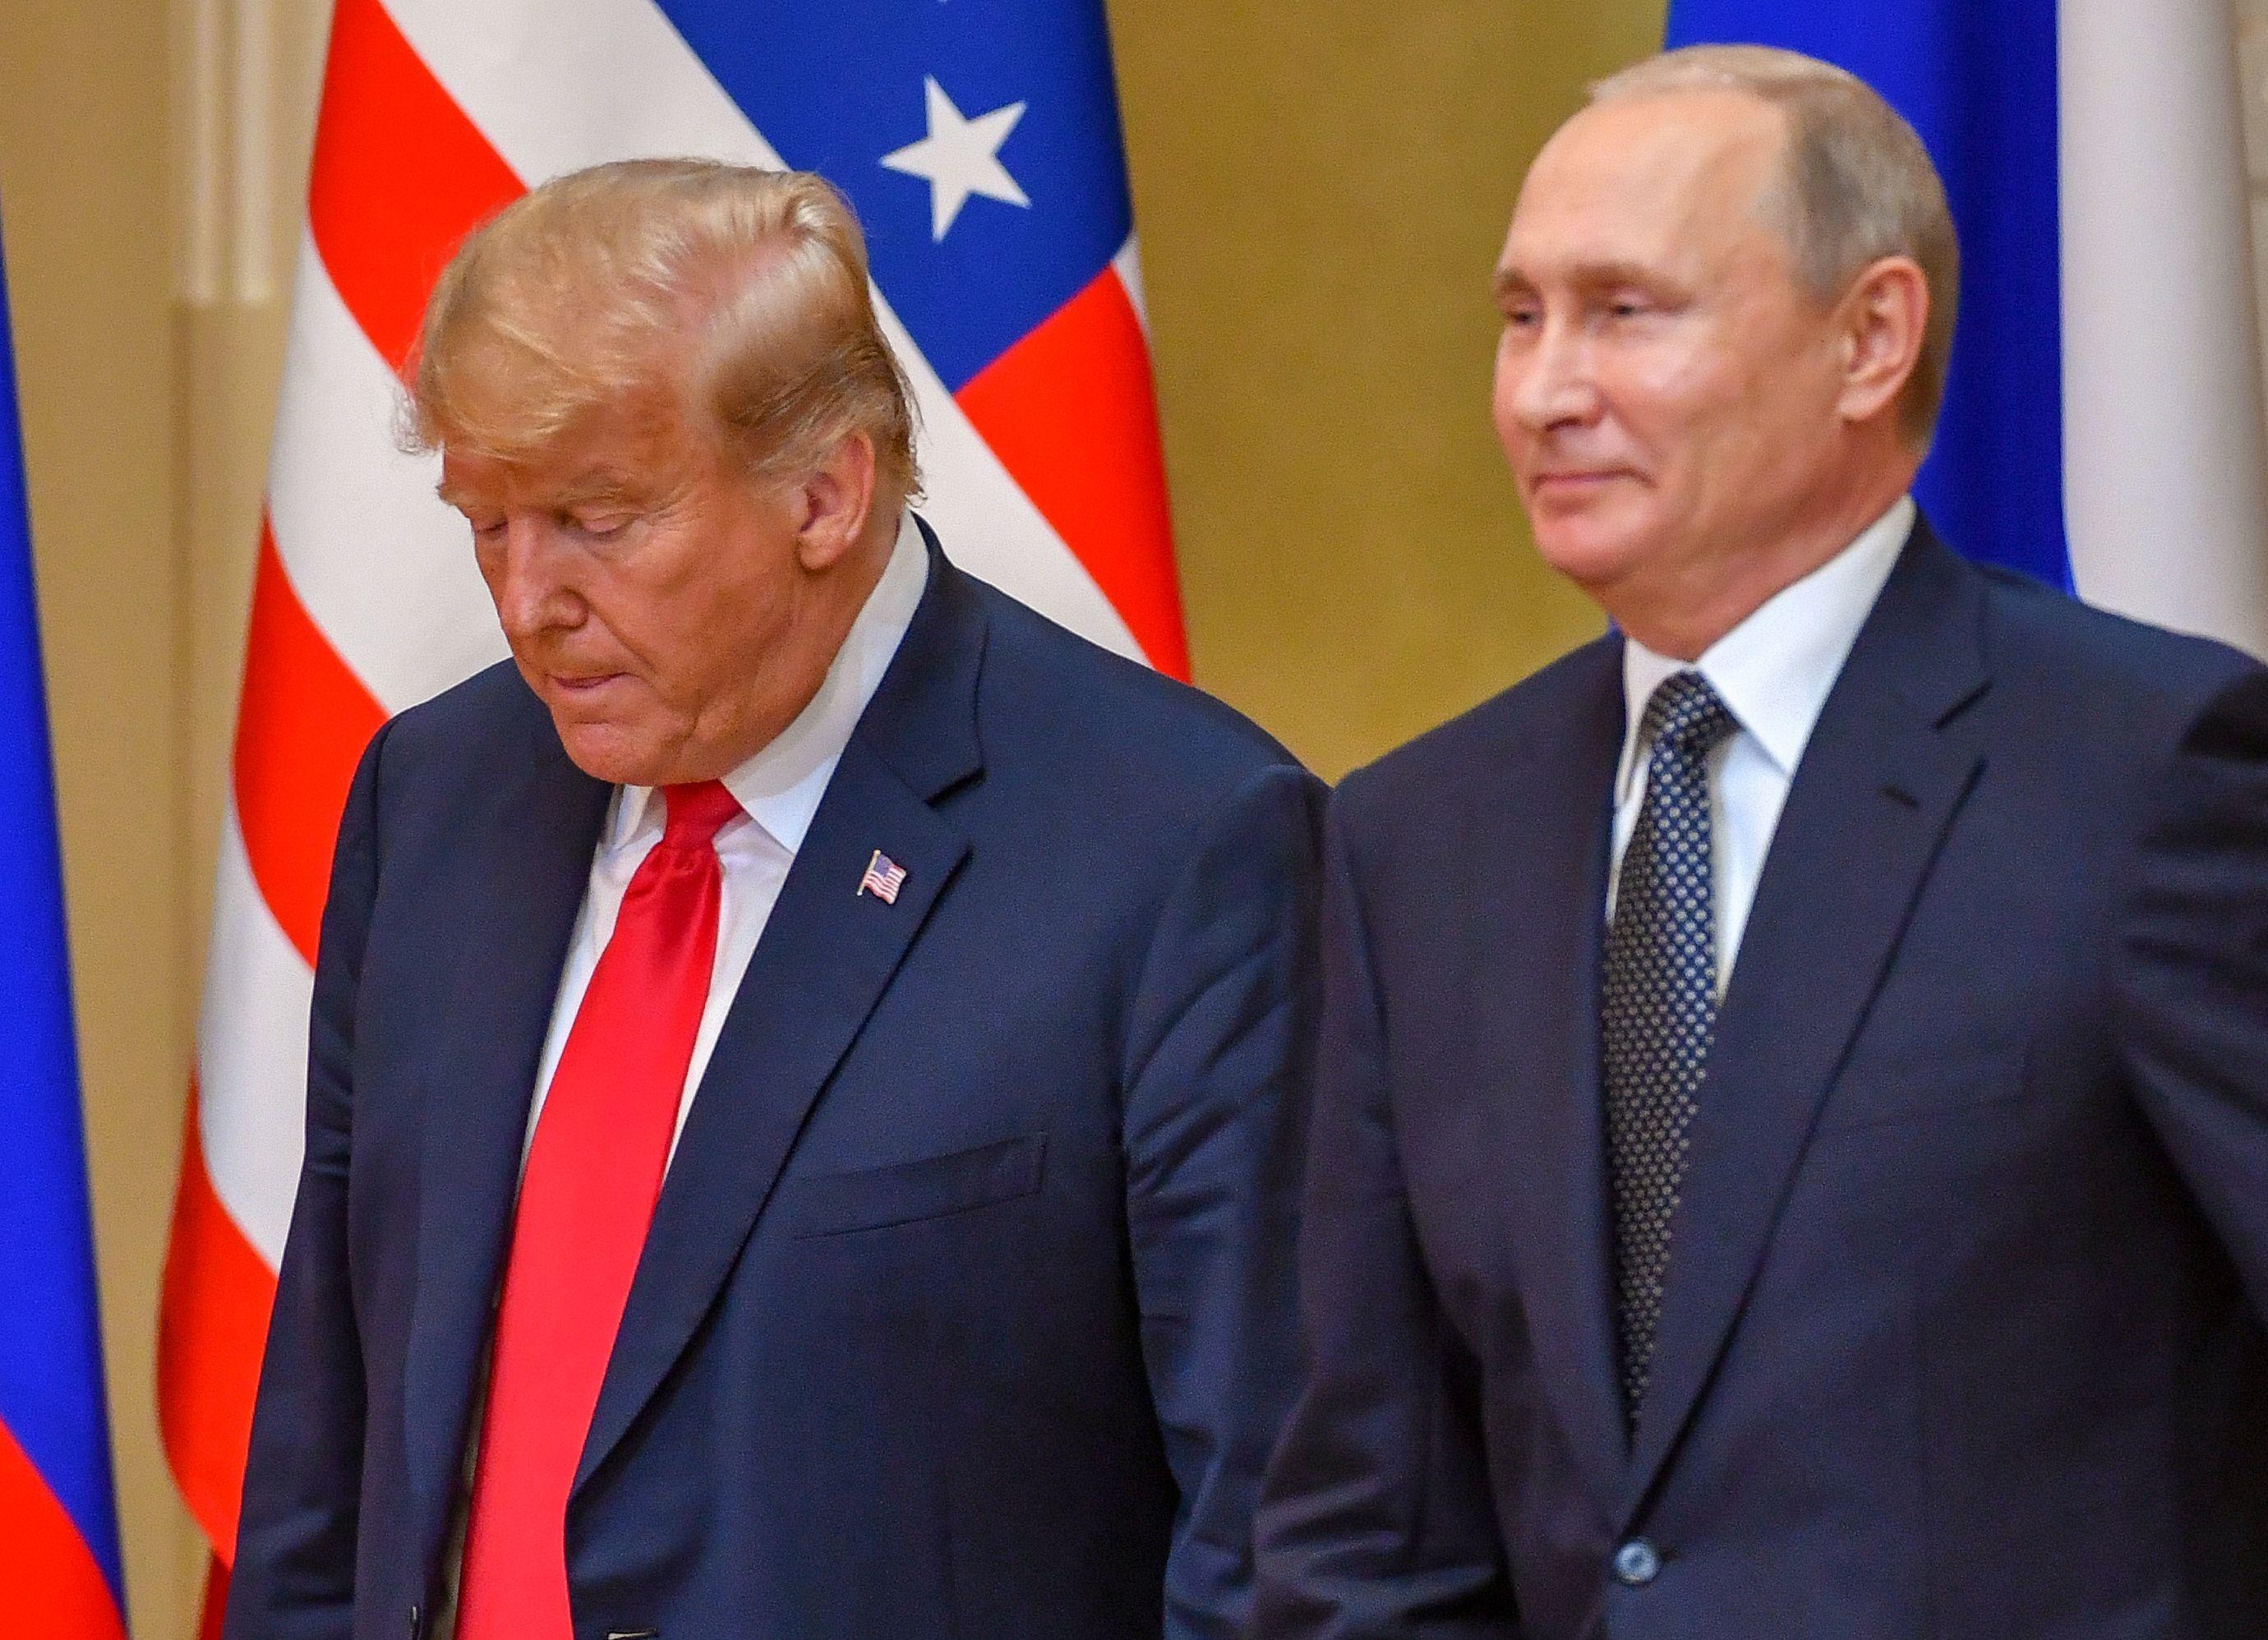 Trump Impeachment odds slashed after Helsinki